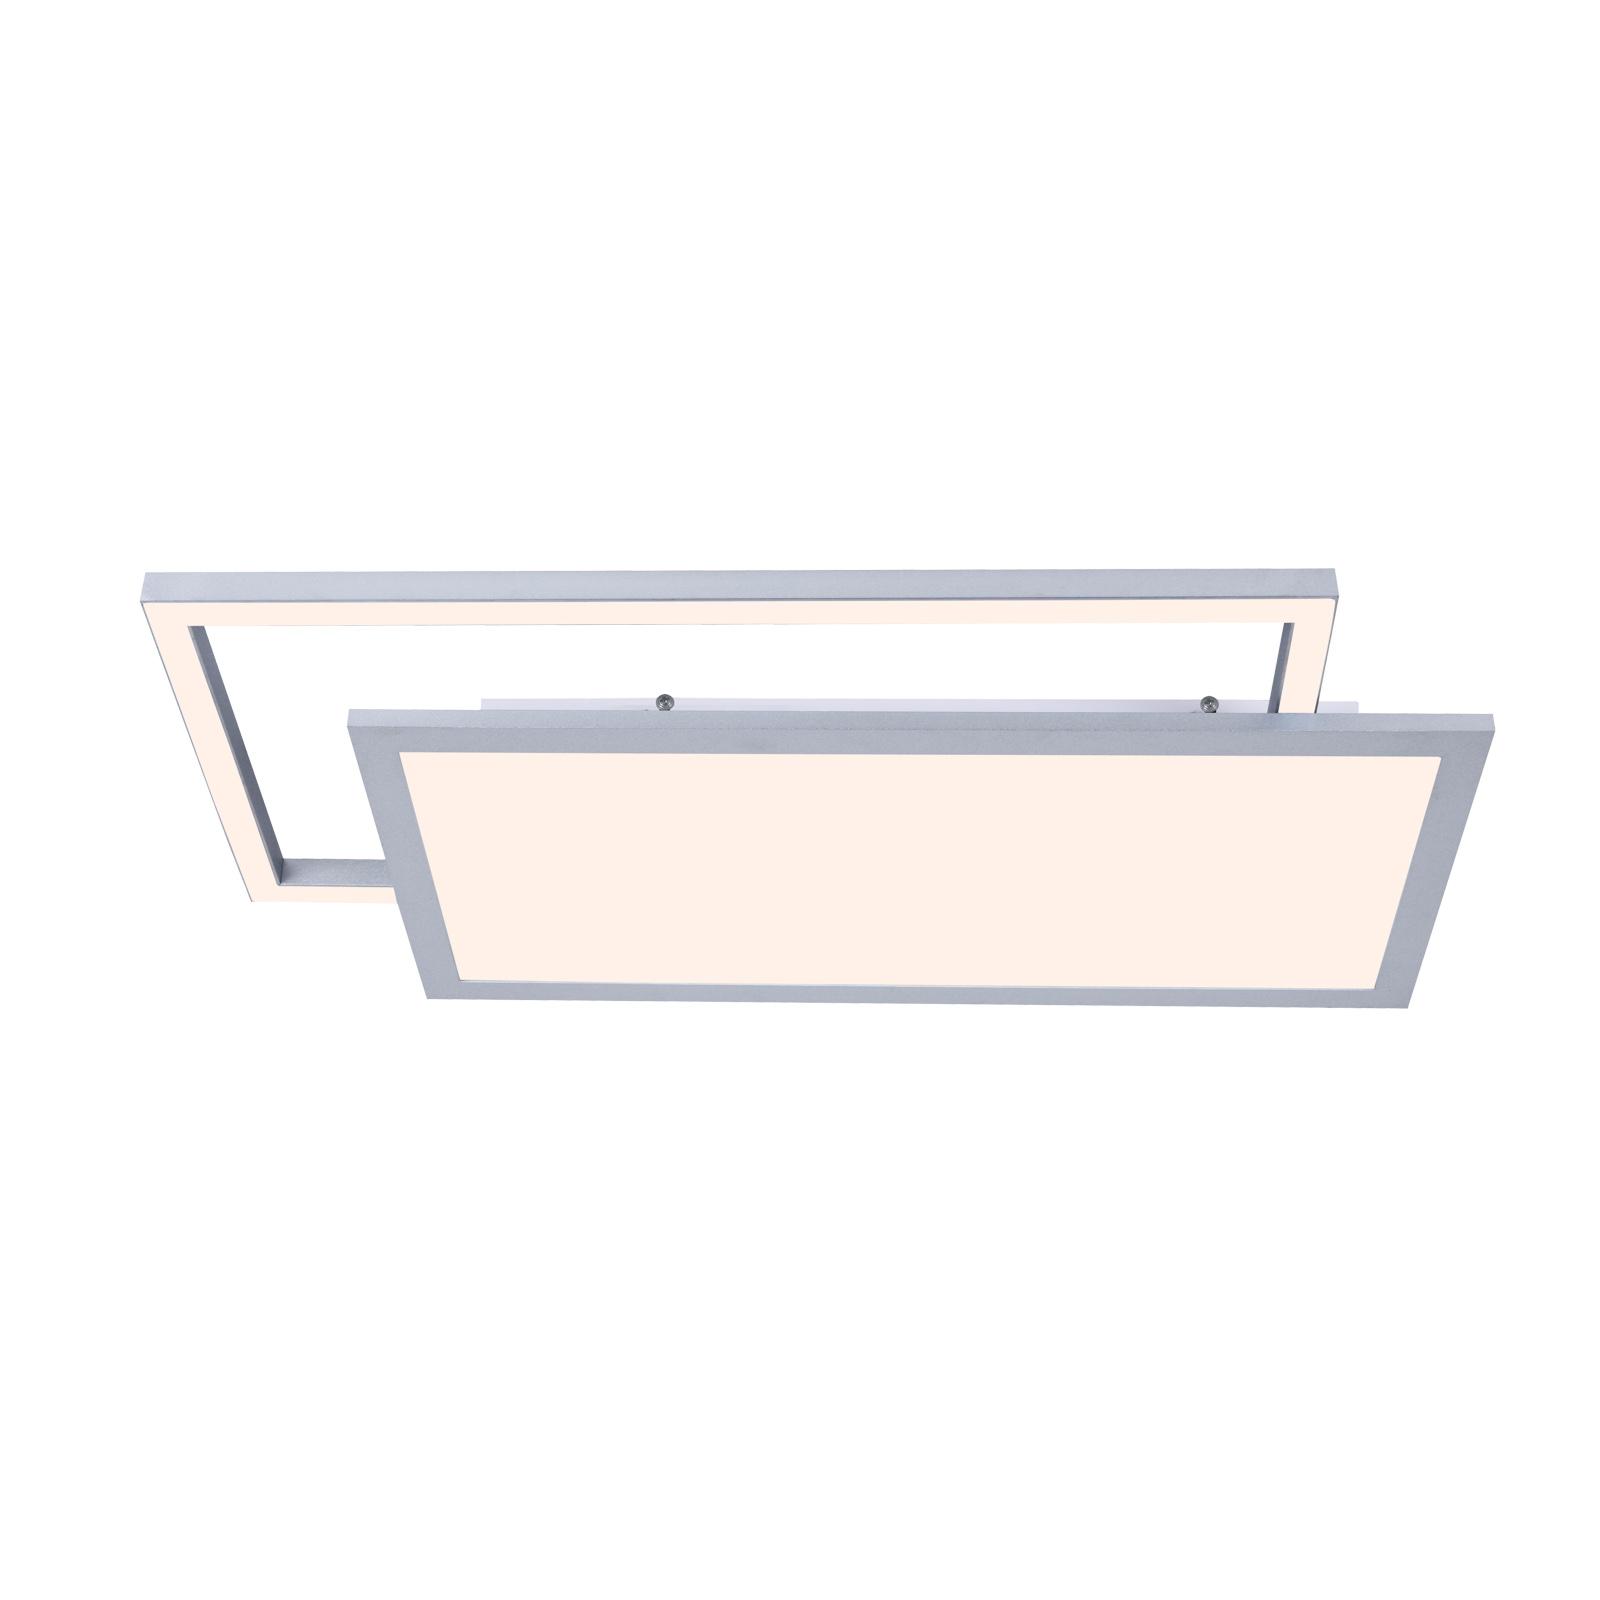 Lucande Senan LED plafondlamp, rechthoeken